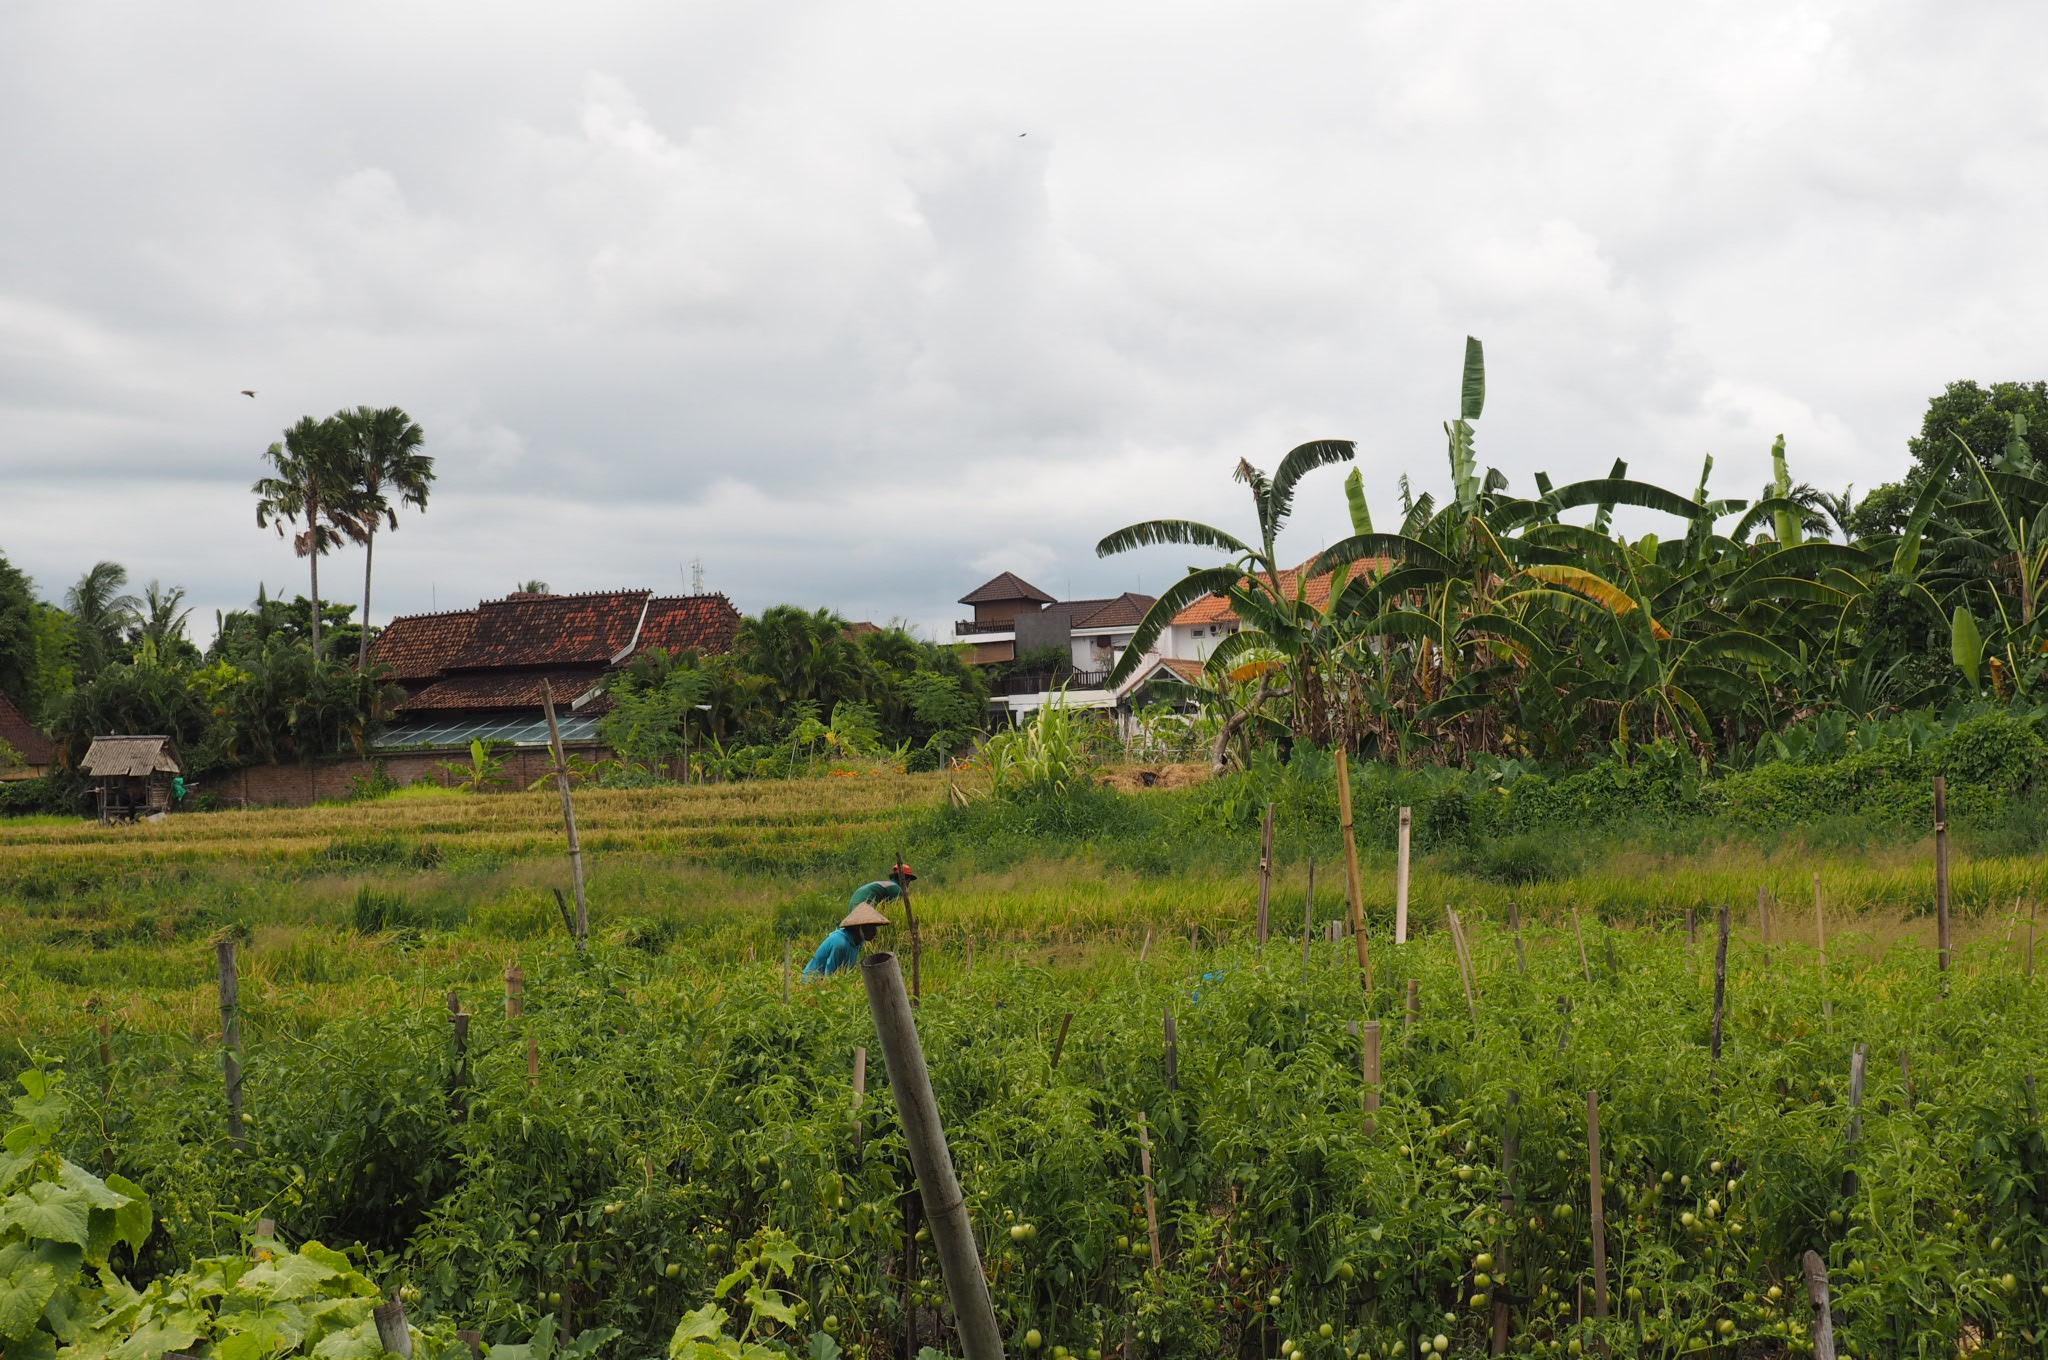 RIce field views in the rainy season